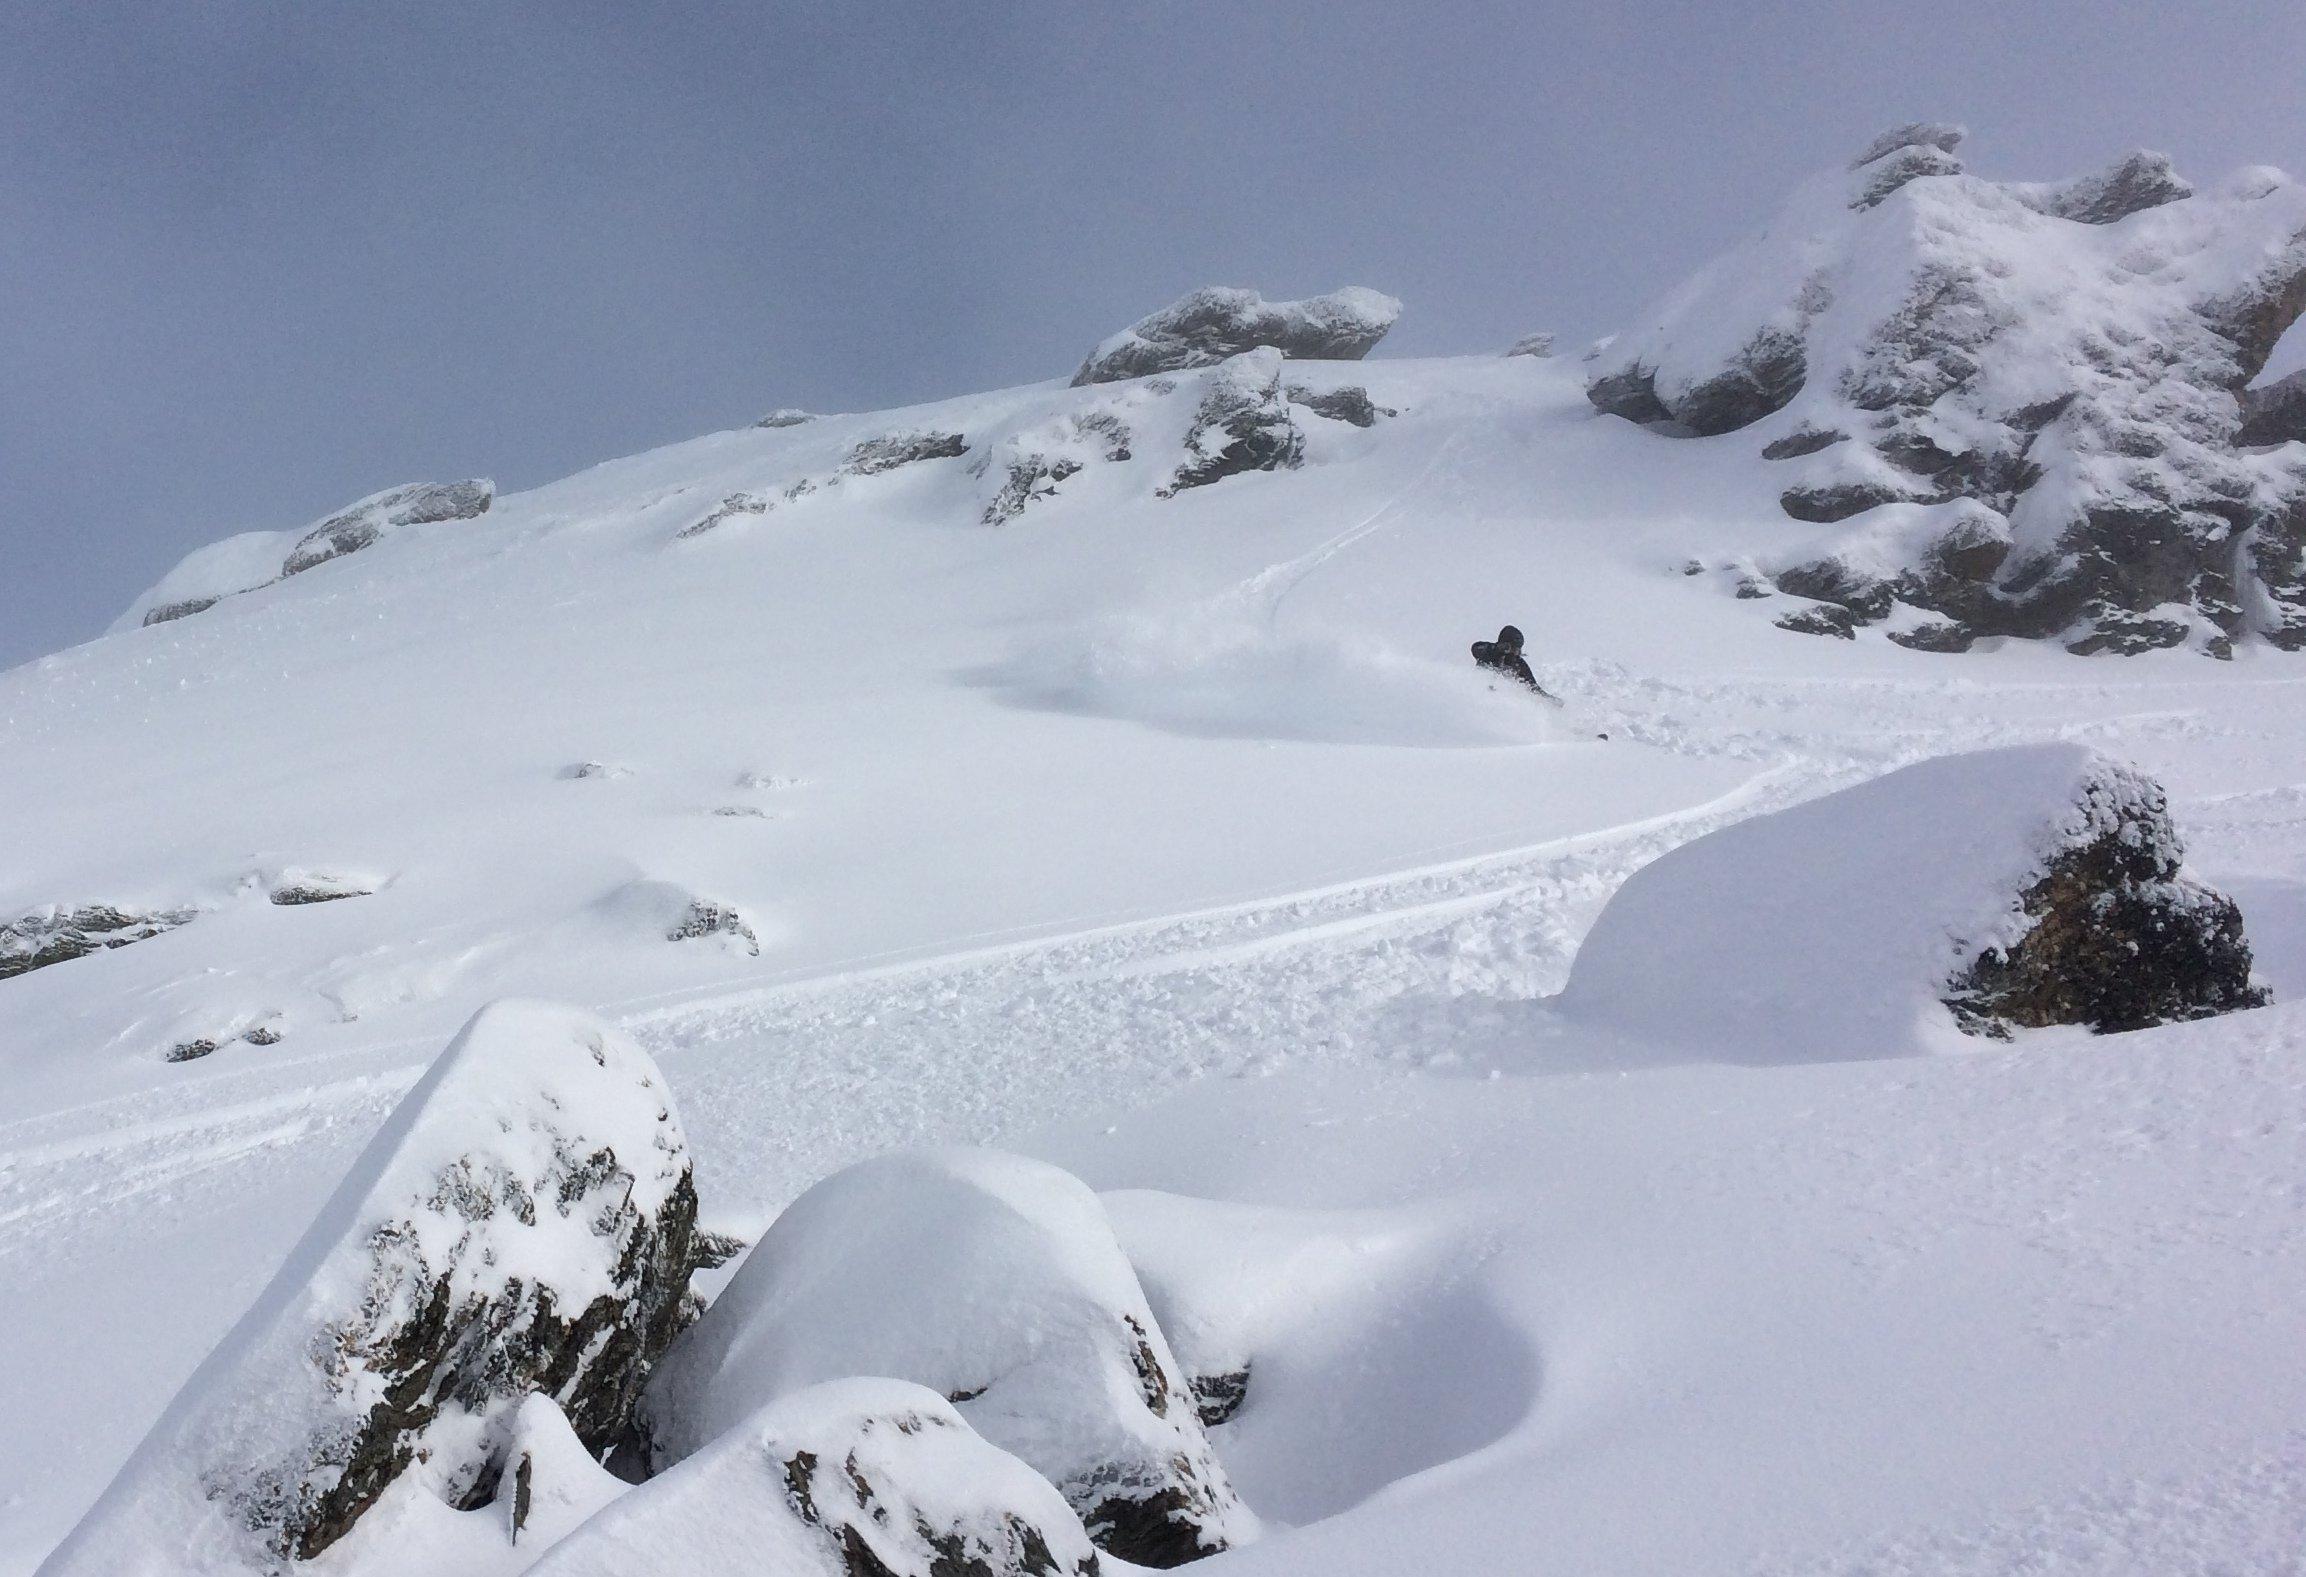 Skiing Amp Snowboarding In New Zealand Cardrona Nz